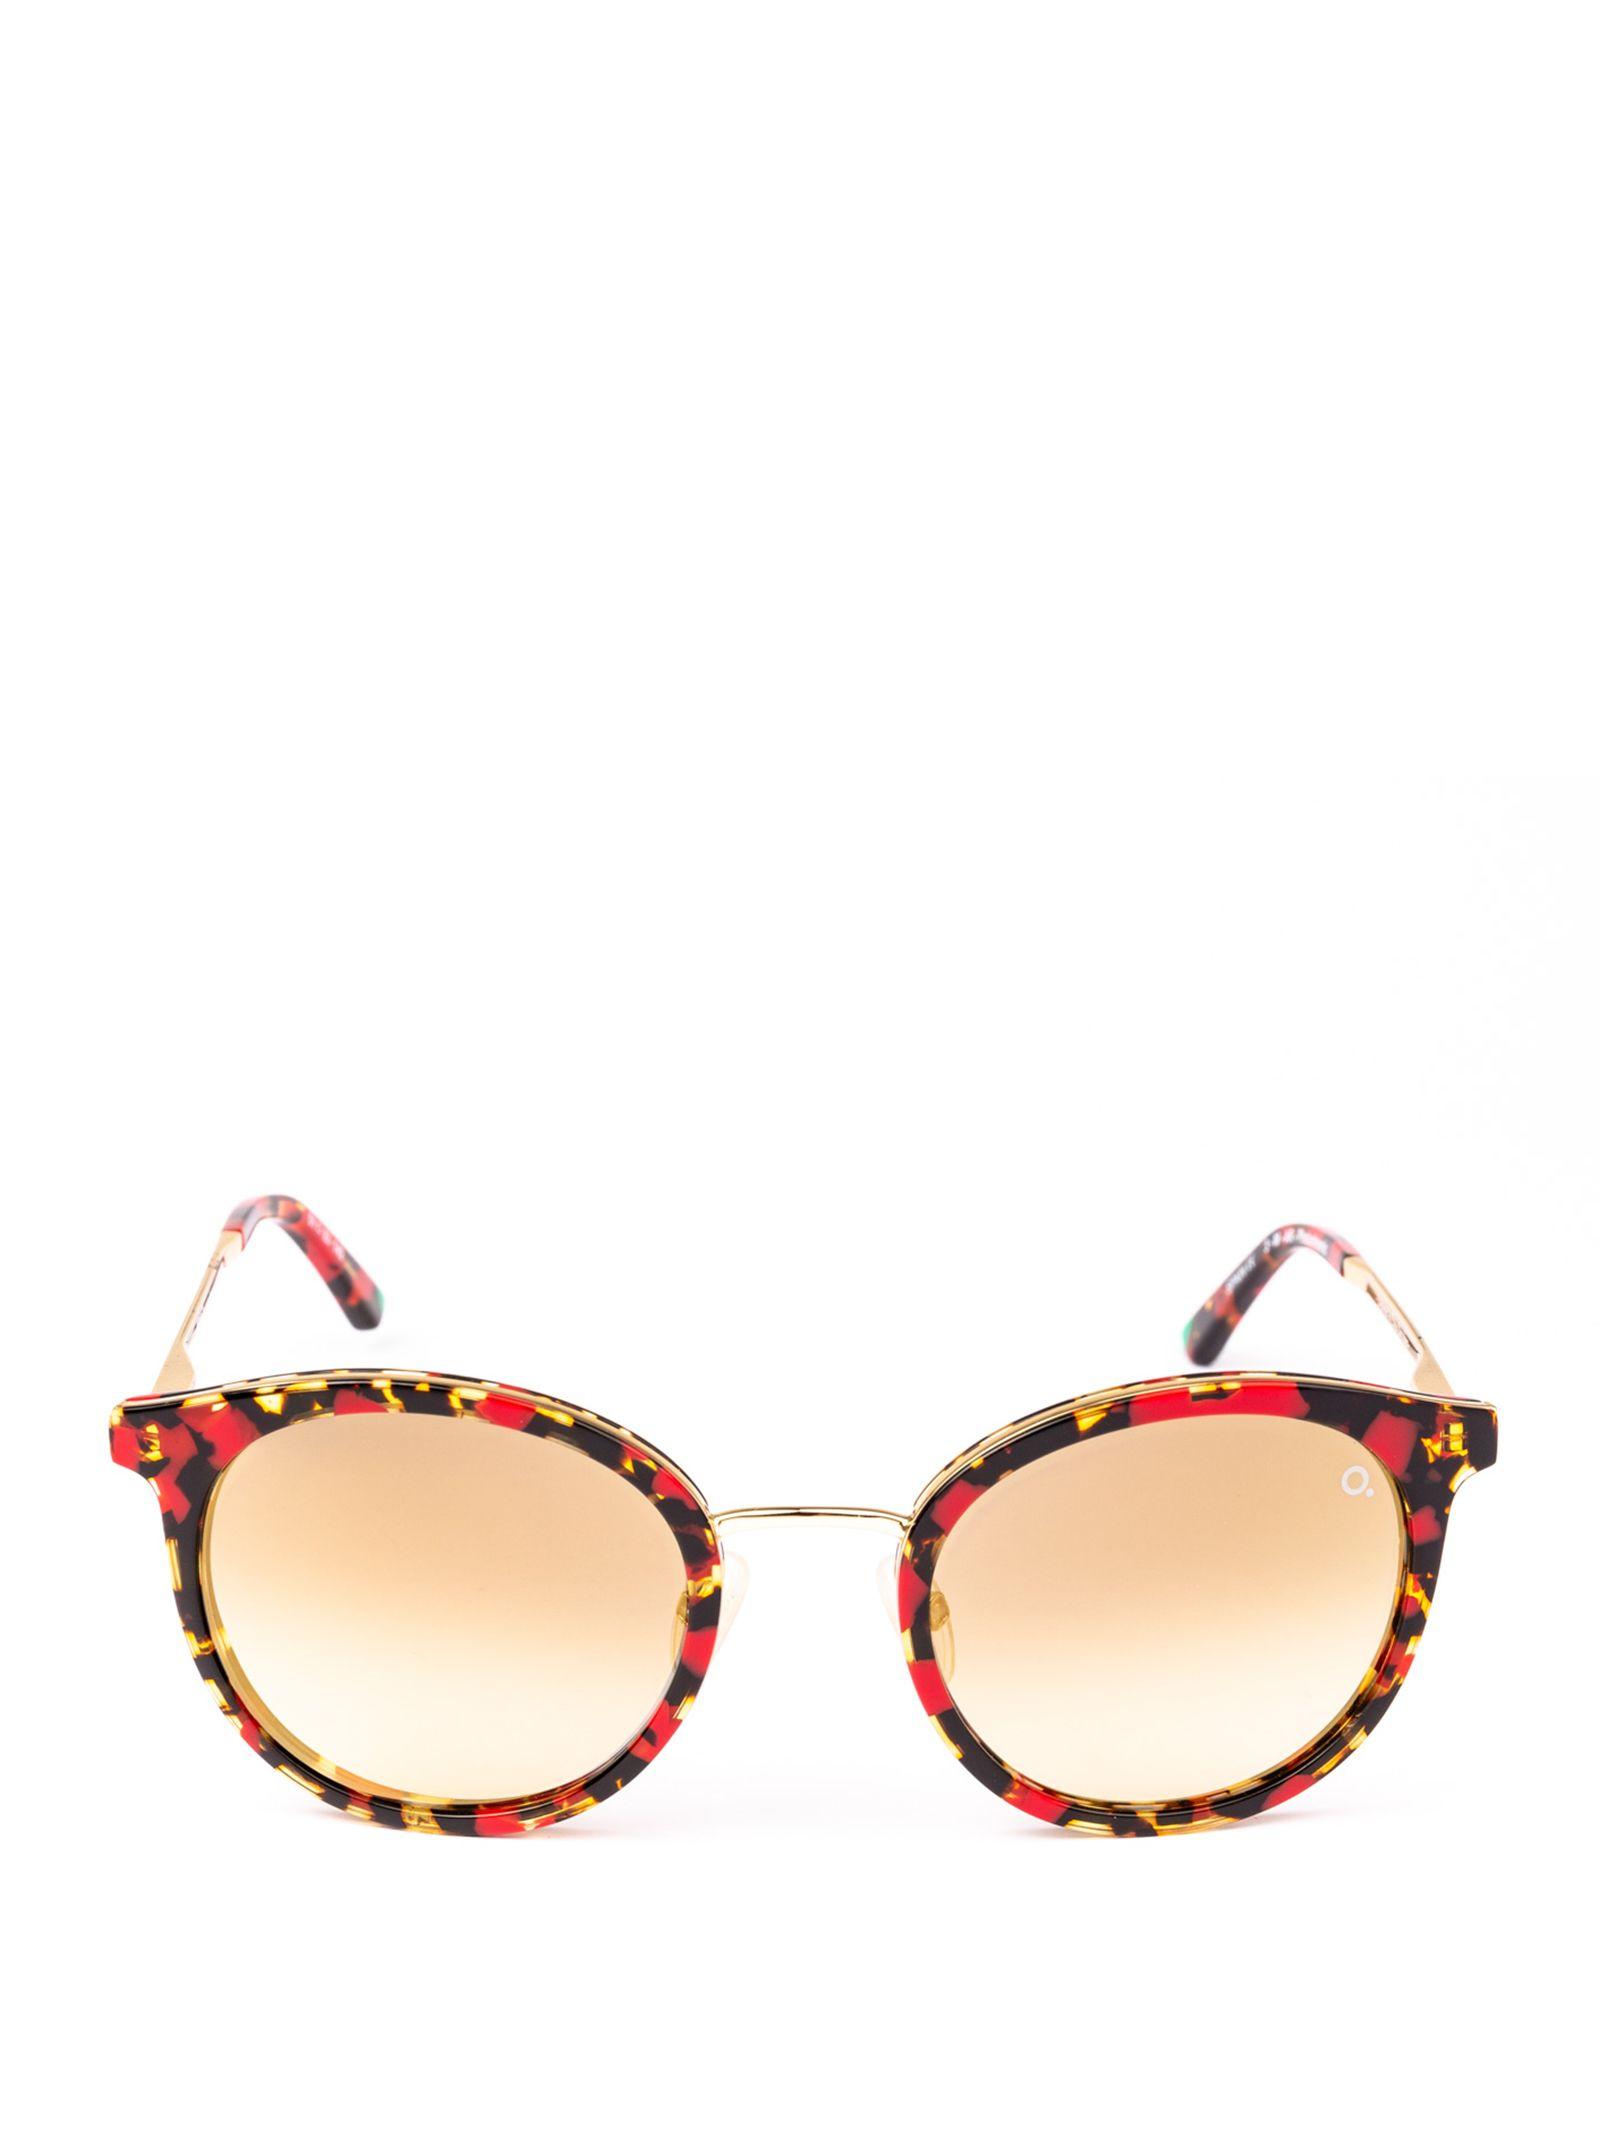 ETNIA BARCELONA Sunglasses in Rdgd